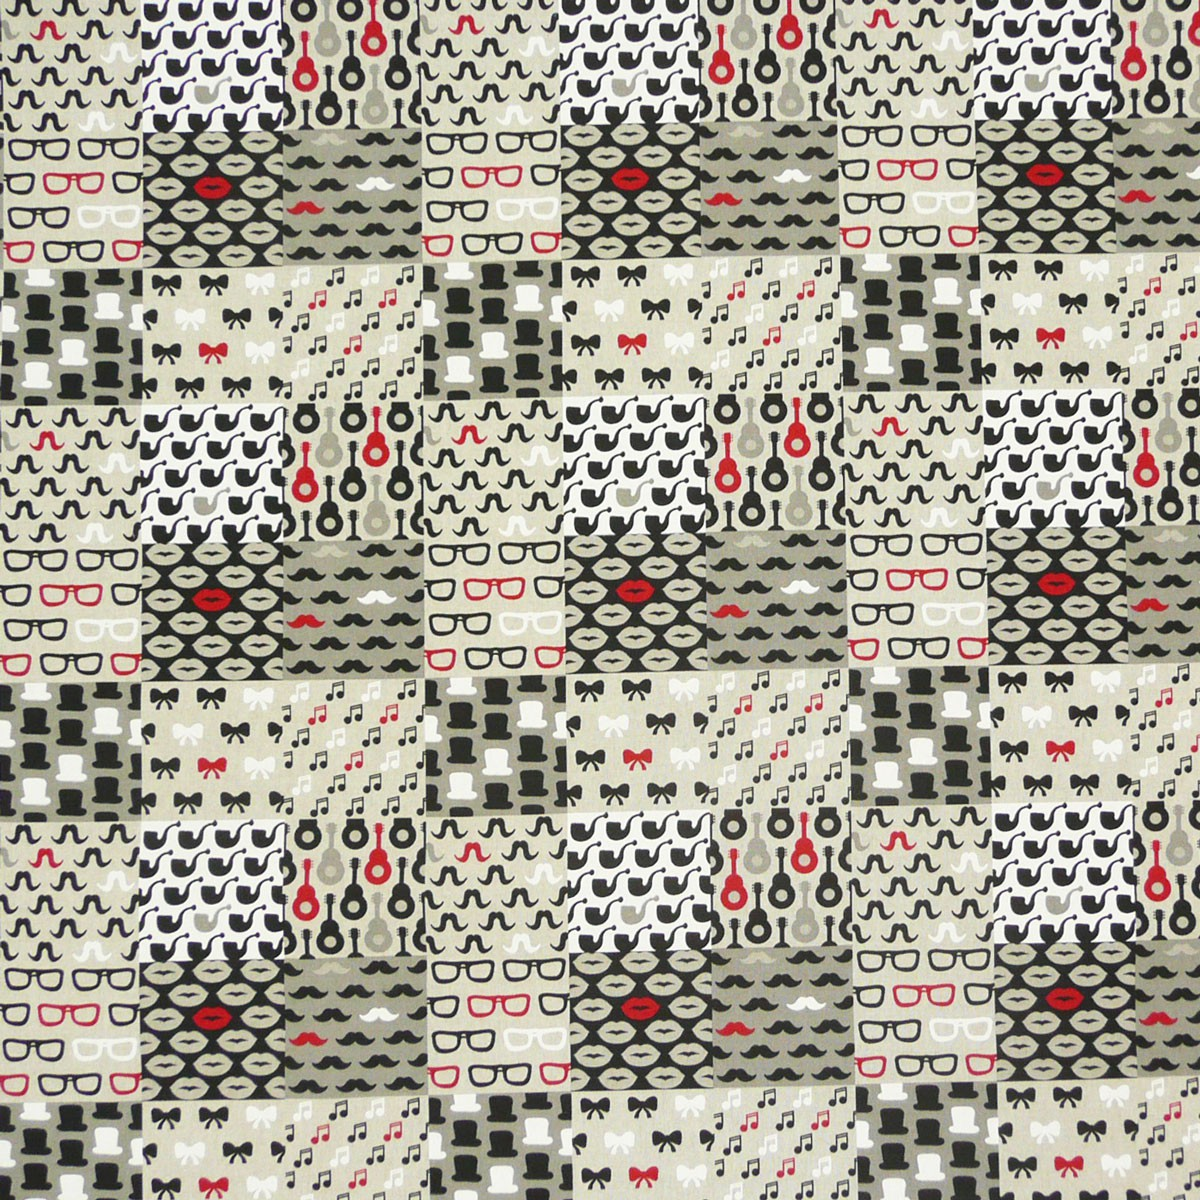 gardinenstoff stoff dekostoff meterware patchwork. Black Bedroom Furniture Sets. Home Design Ideas